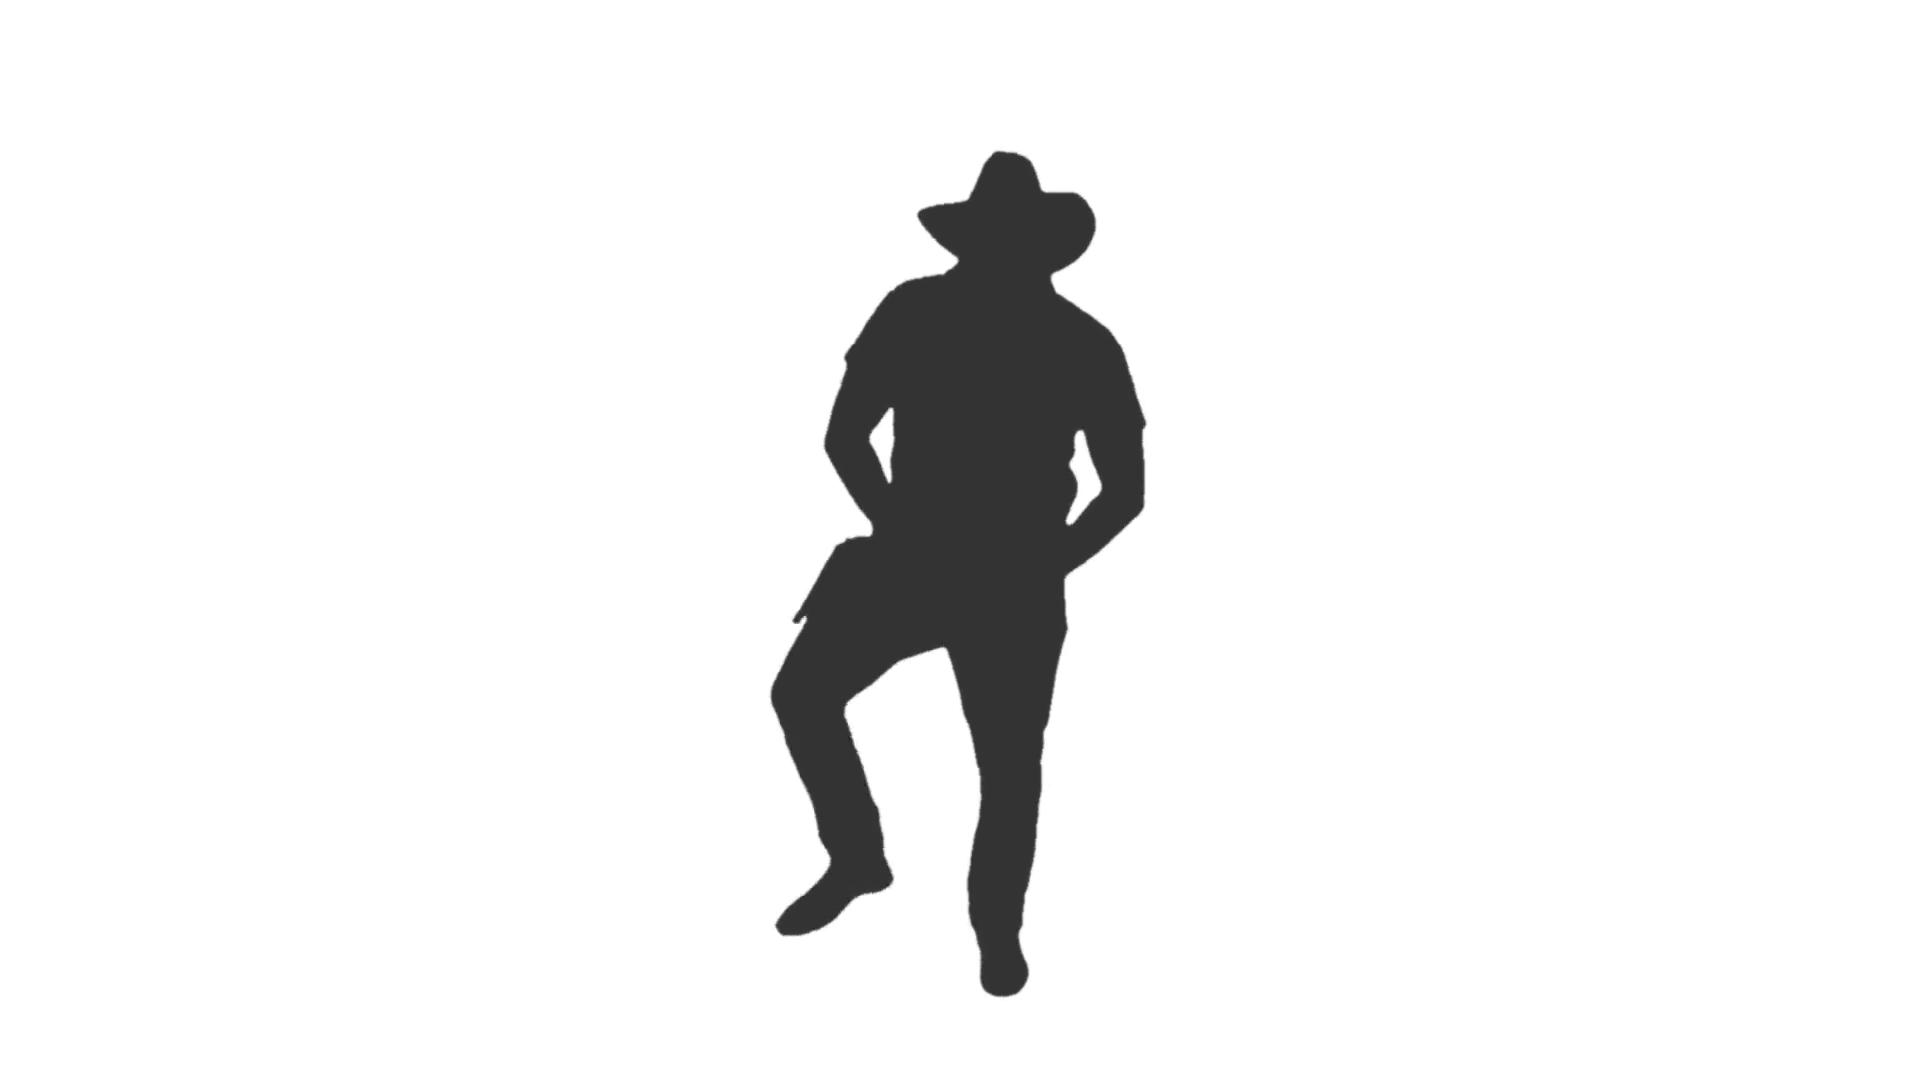 My Funny Cowboy Dance: A Quiz